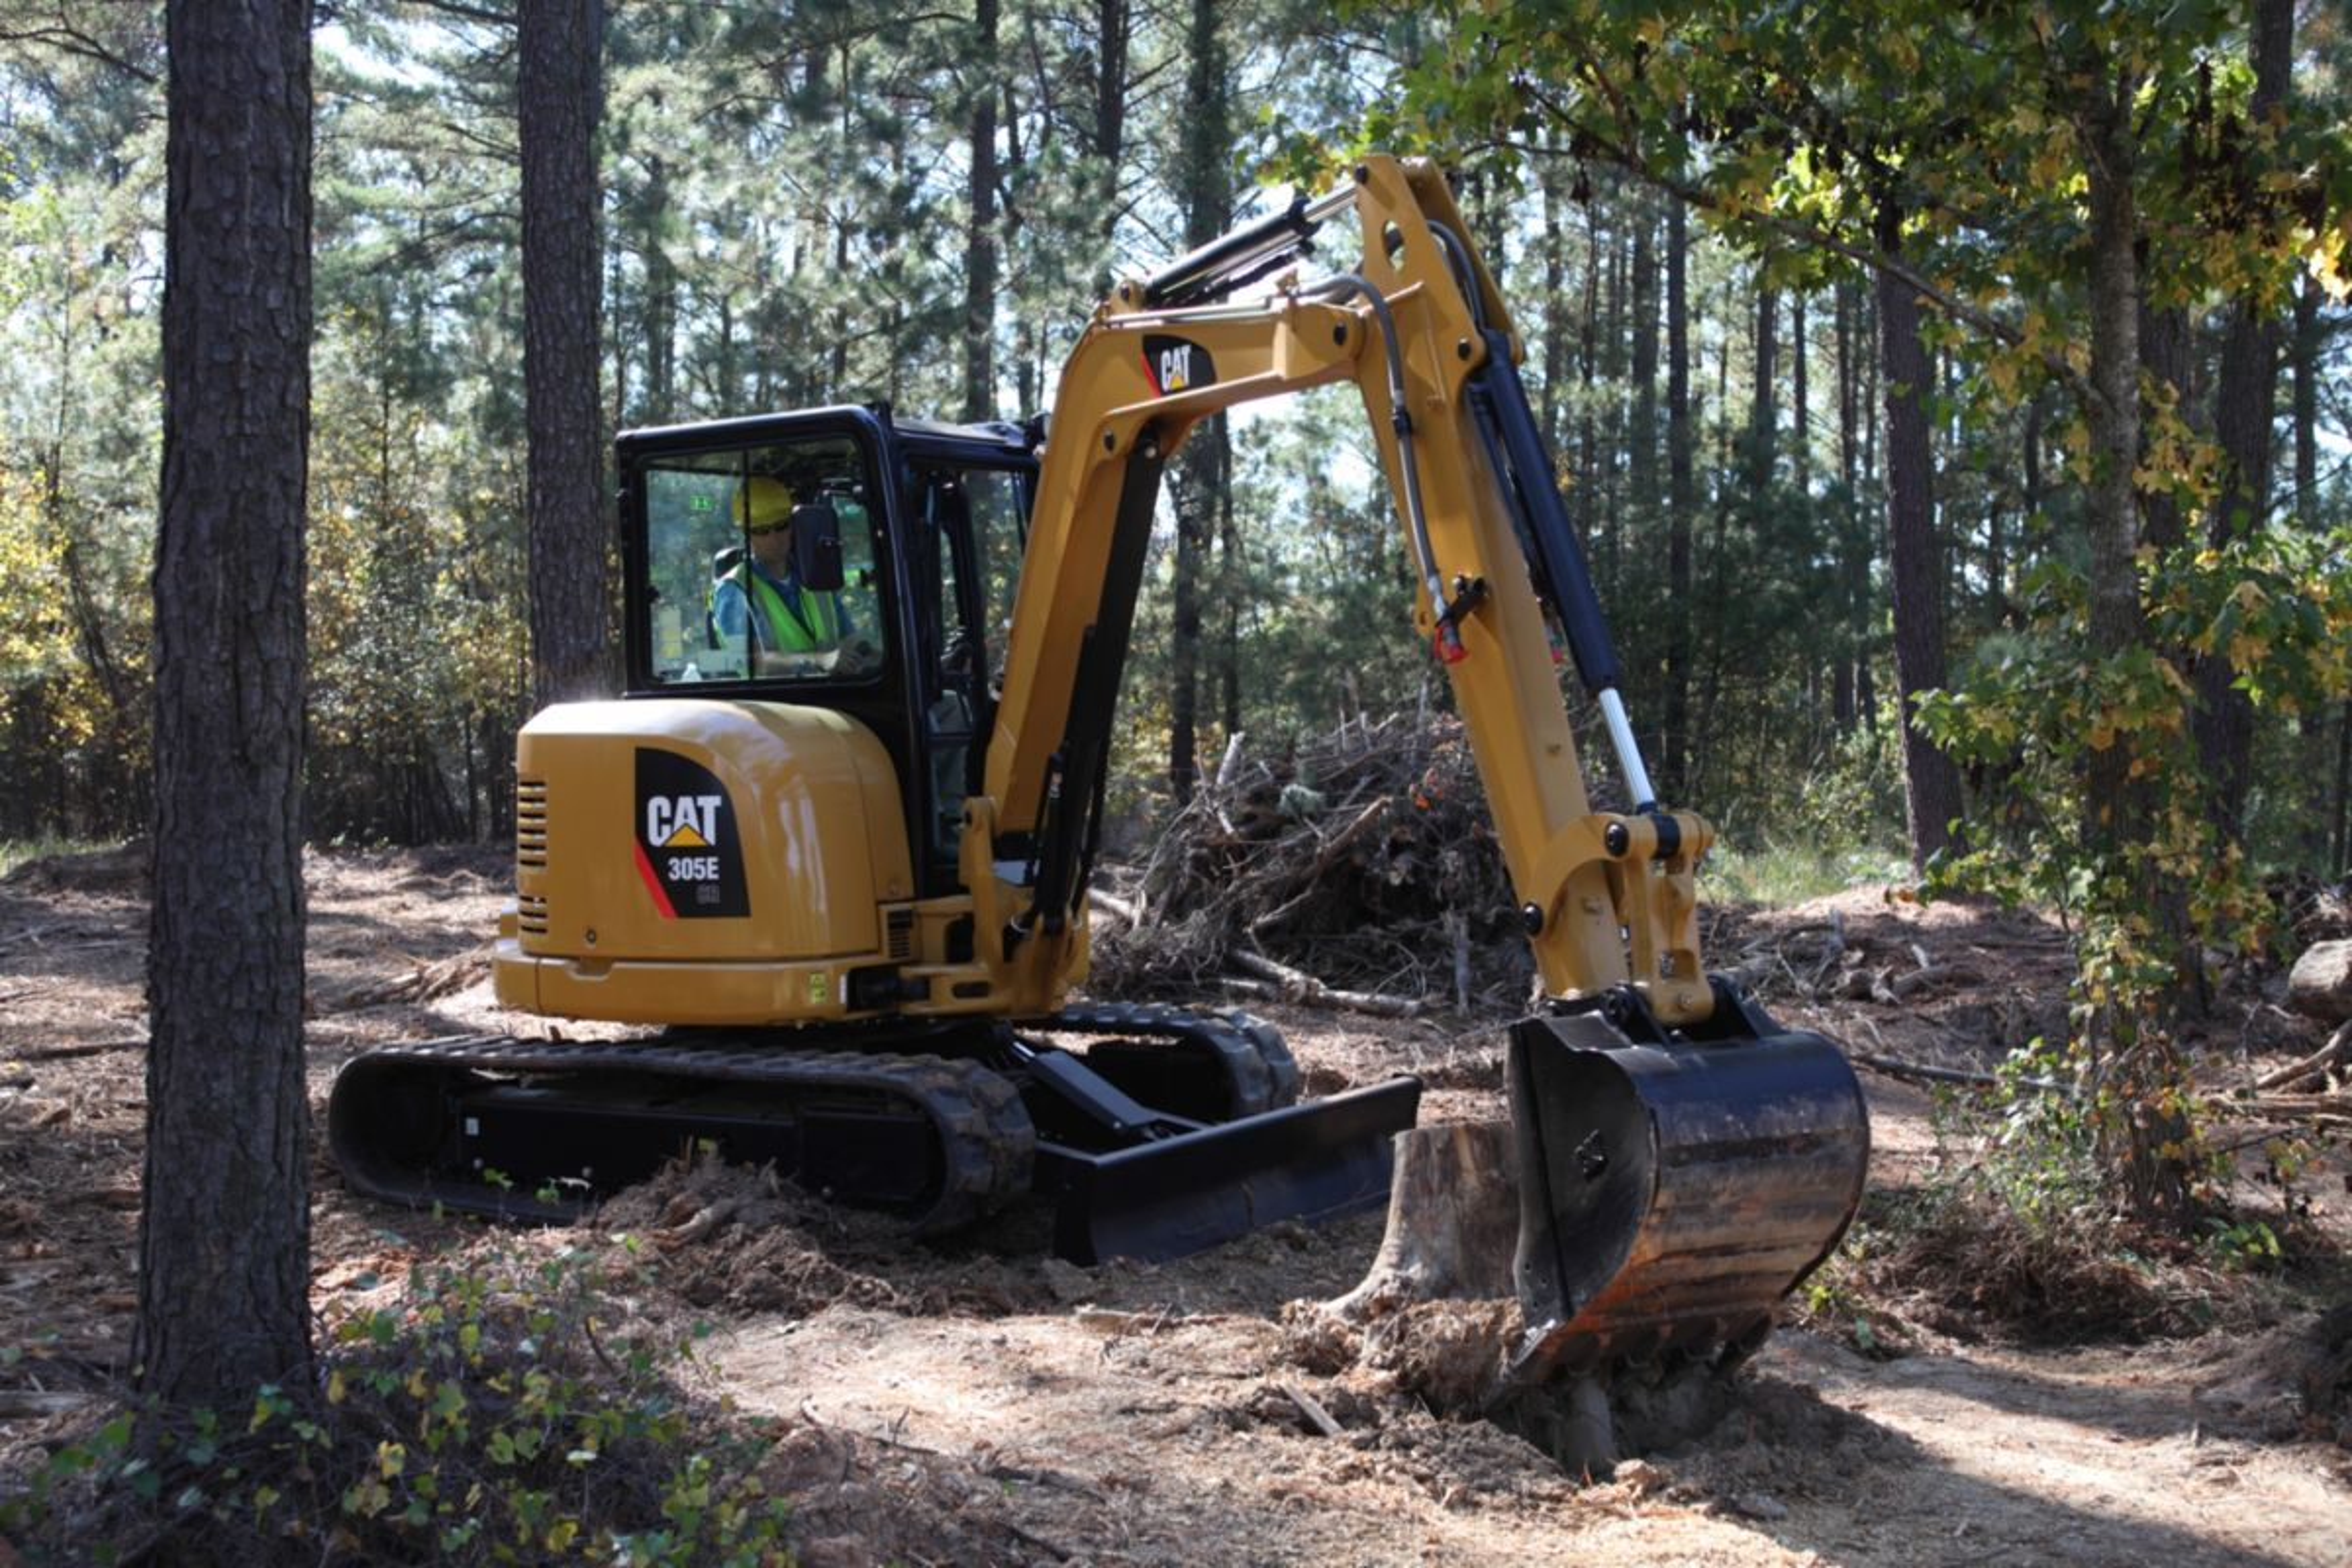 Cat excavator deals ink48 hotel deals cat 320 excavator compare prices at nextag fandeluxe Image collections